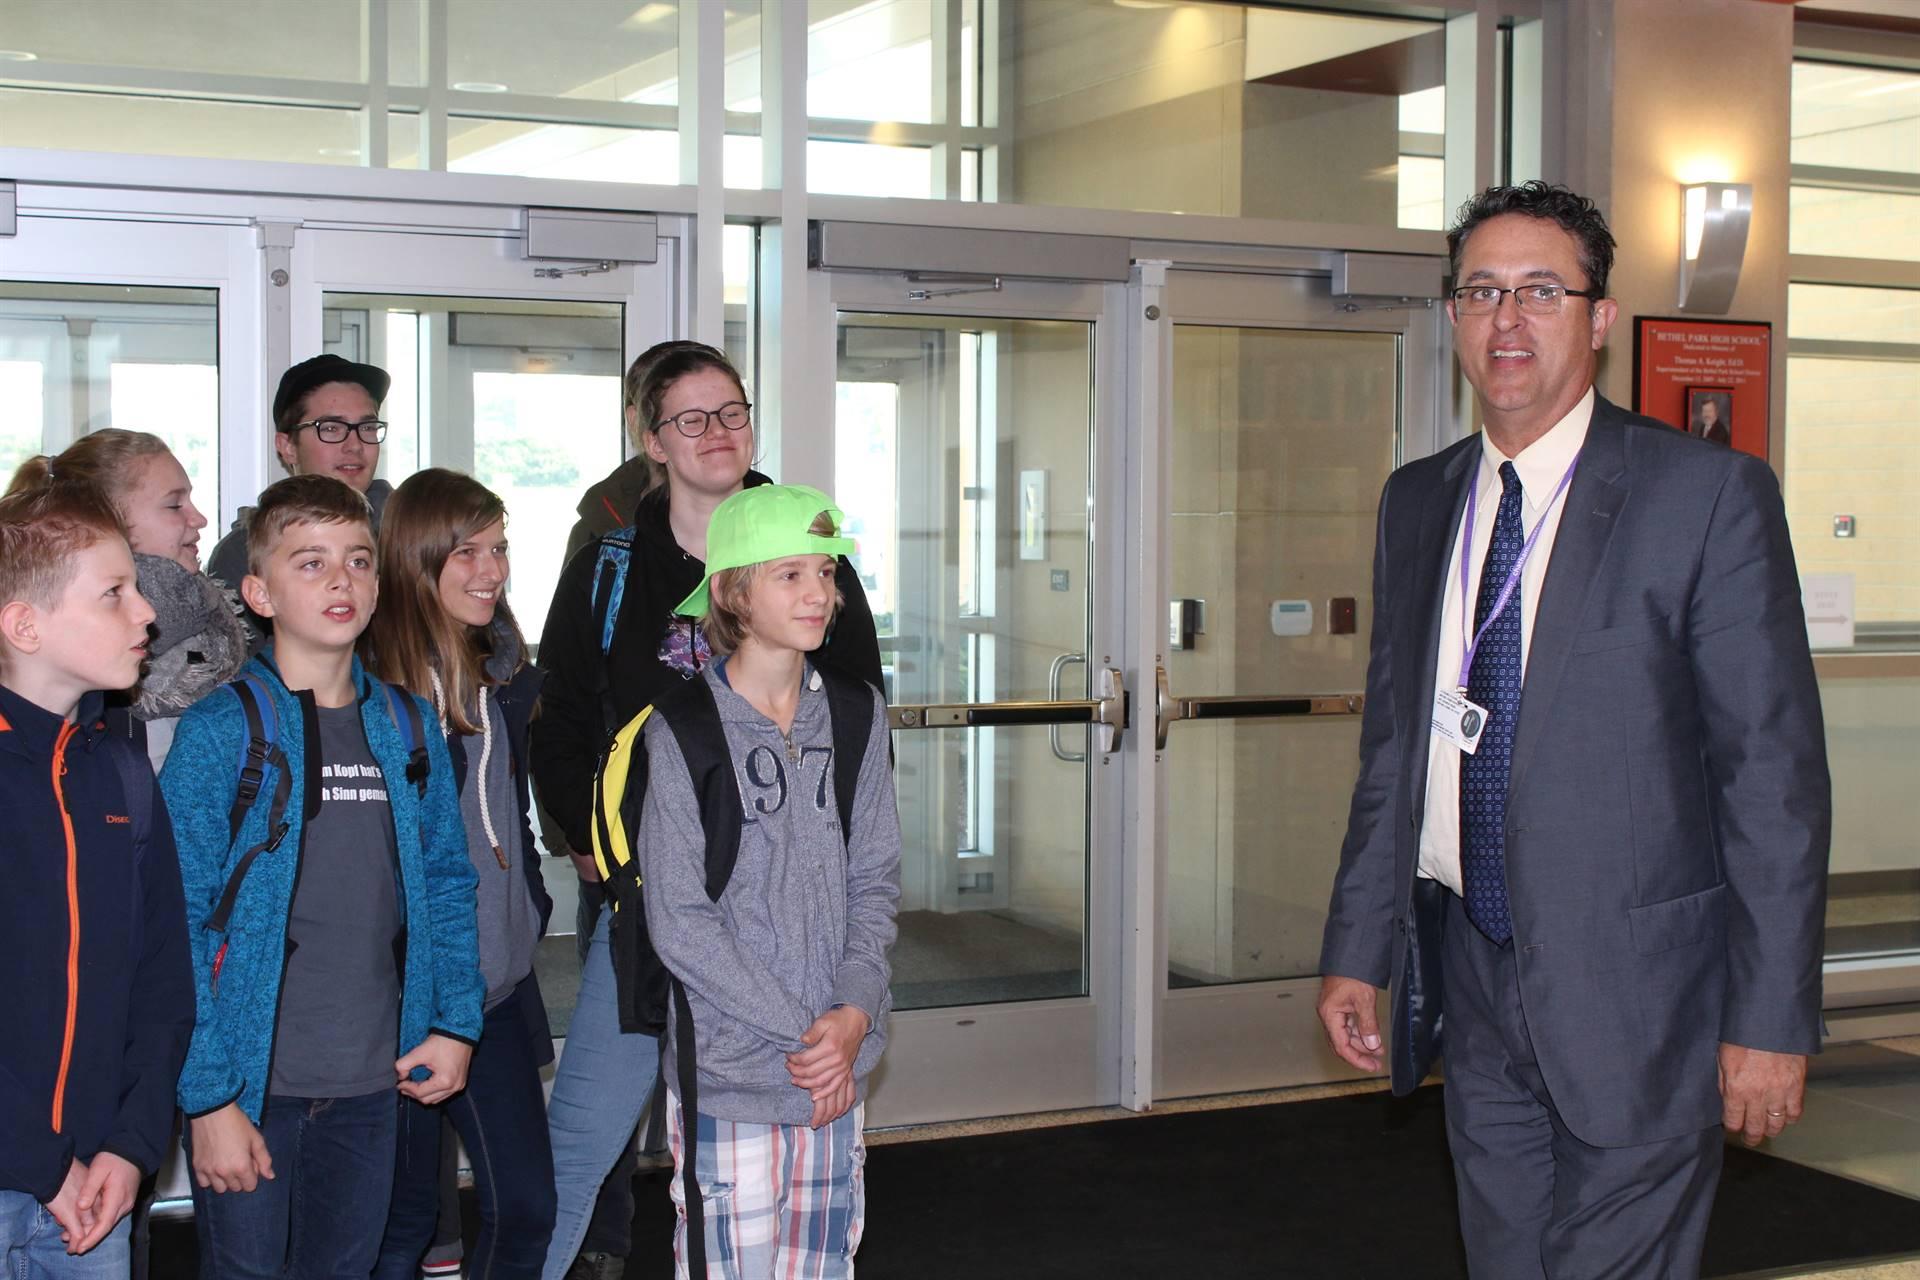 BPHS Principal Dr. Zeb Jansante welcomes the visiting German students